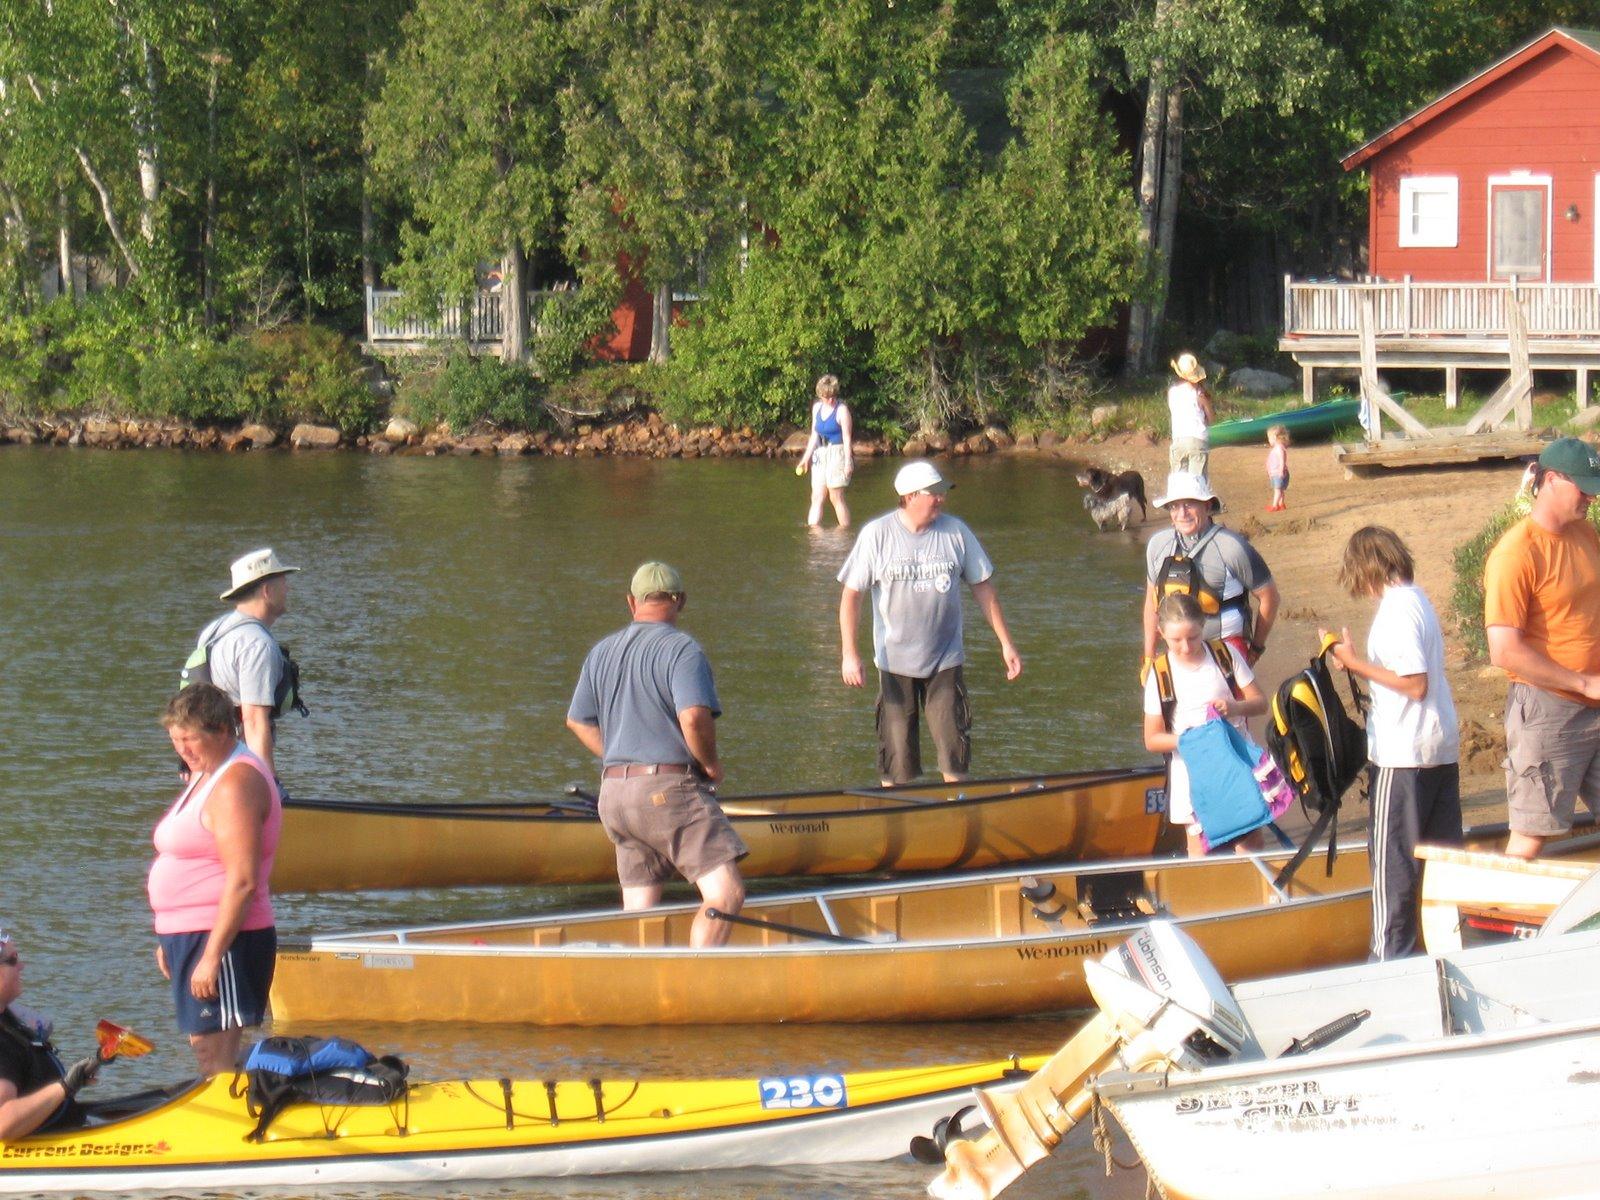 [Adirondack+Classic+Sept+7,8,9,2007++Bob+&+Leigh+098.jpg]